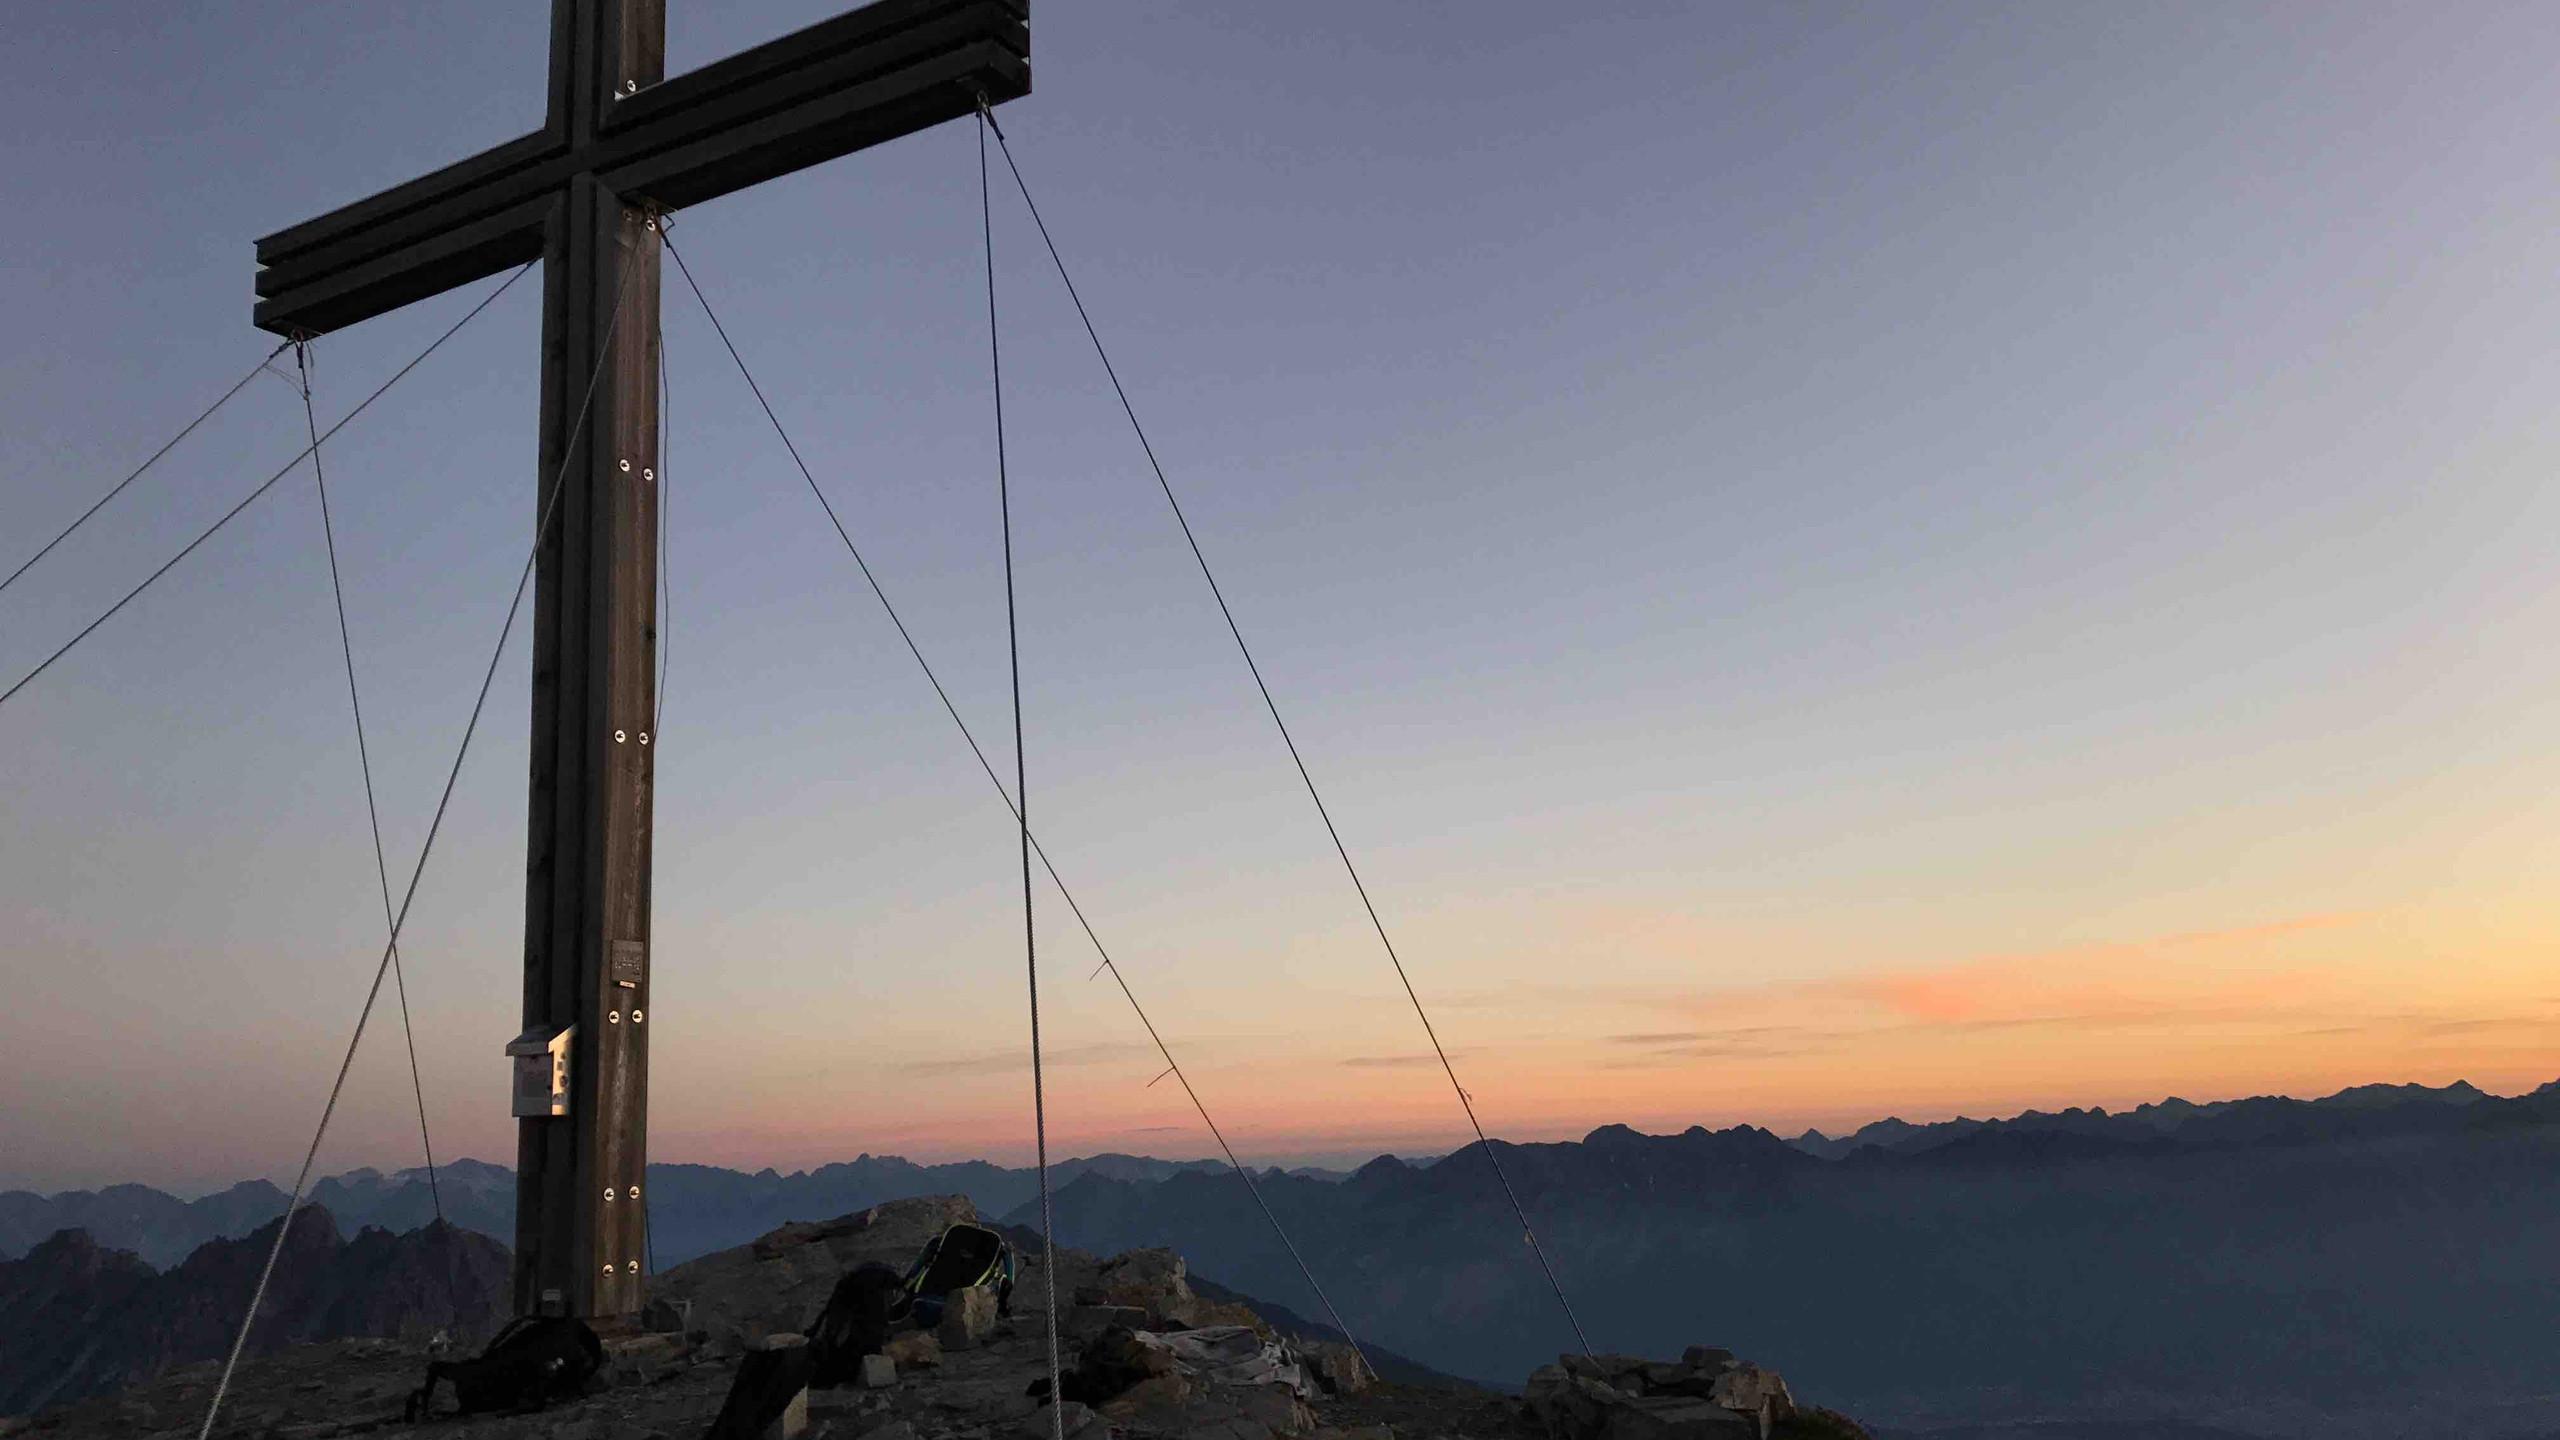 Gipfelkreuz Serles, Sonnenaufgangstour Serles